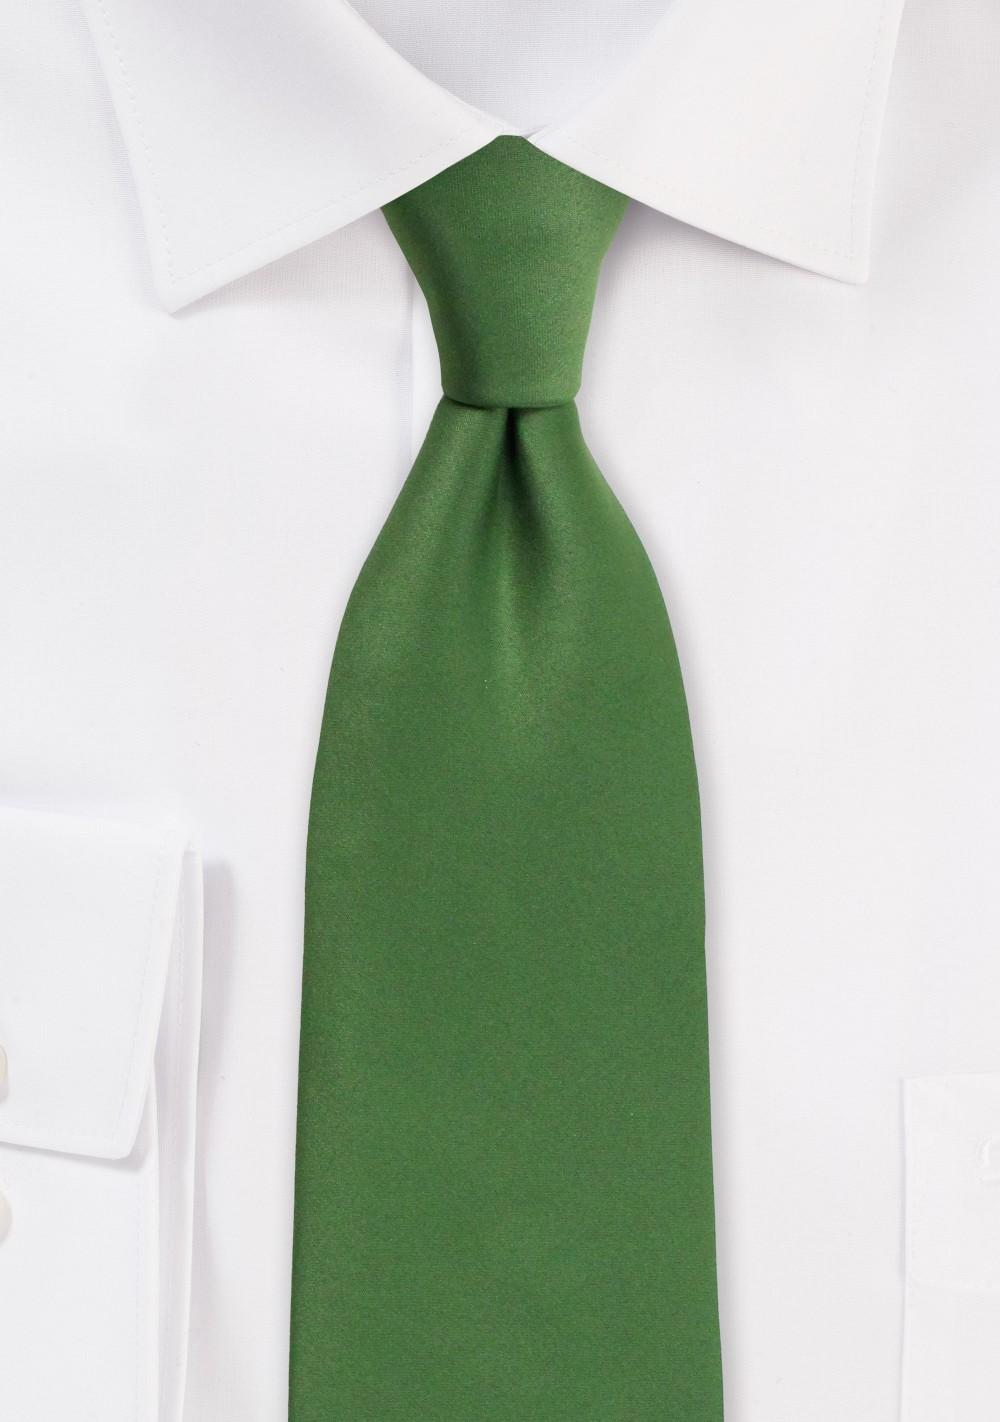 Satin Mens Tie in Moss Green